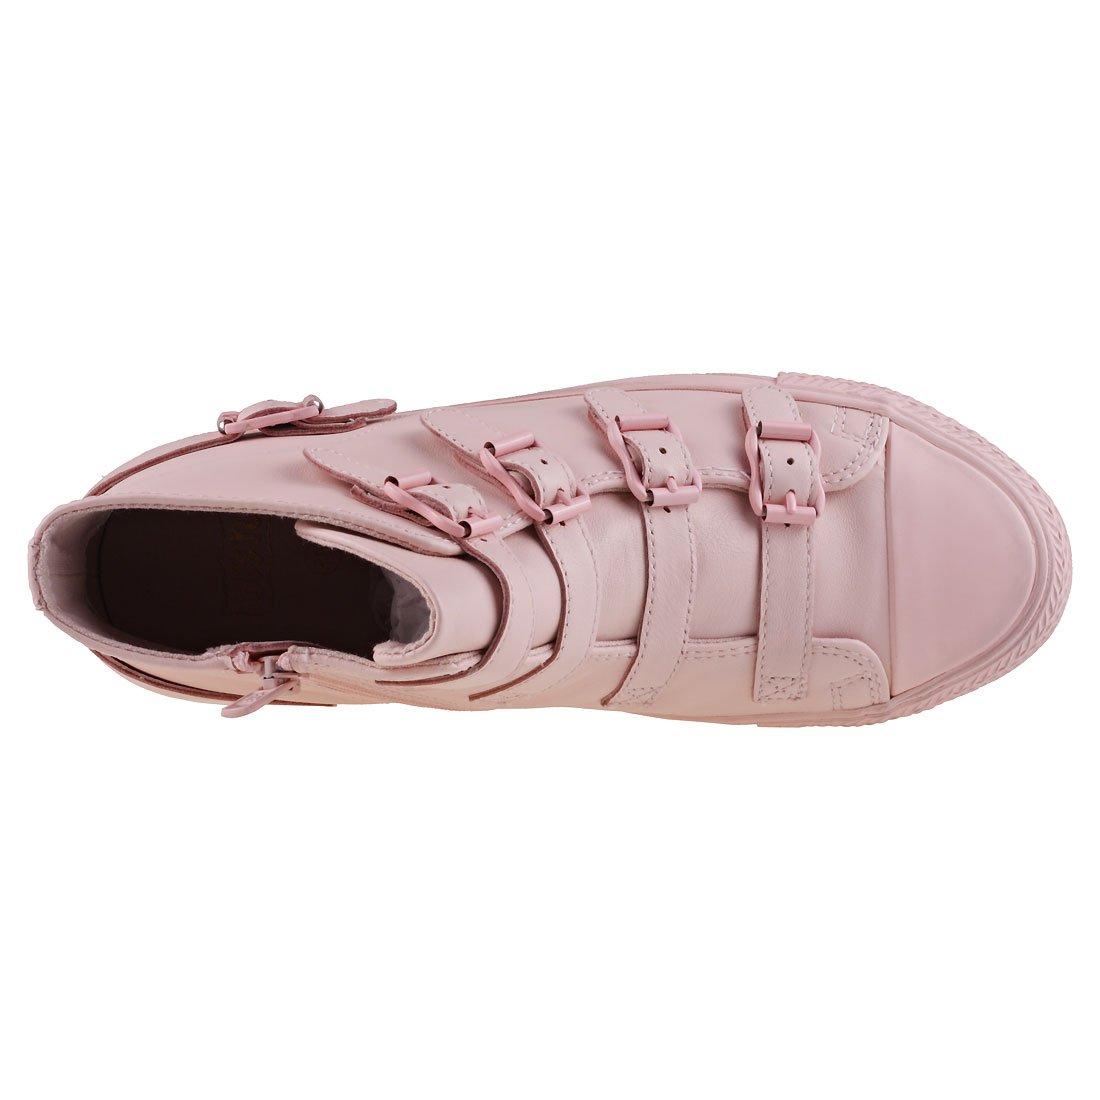 Ash Schuhe Venus Powder Turnschuhe Turnschuhe Turnschuhe Aus Leder Damen bb896b